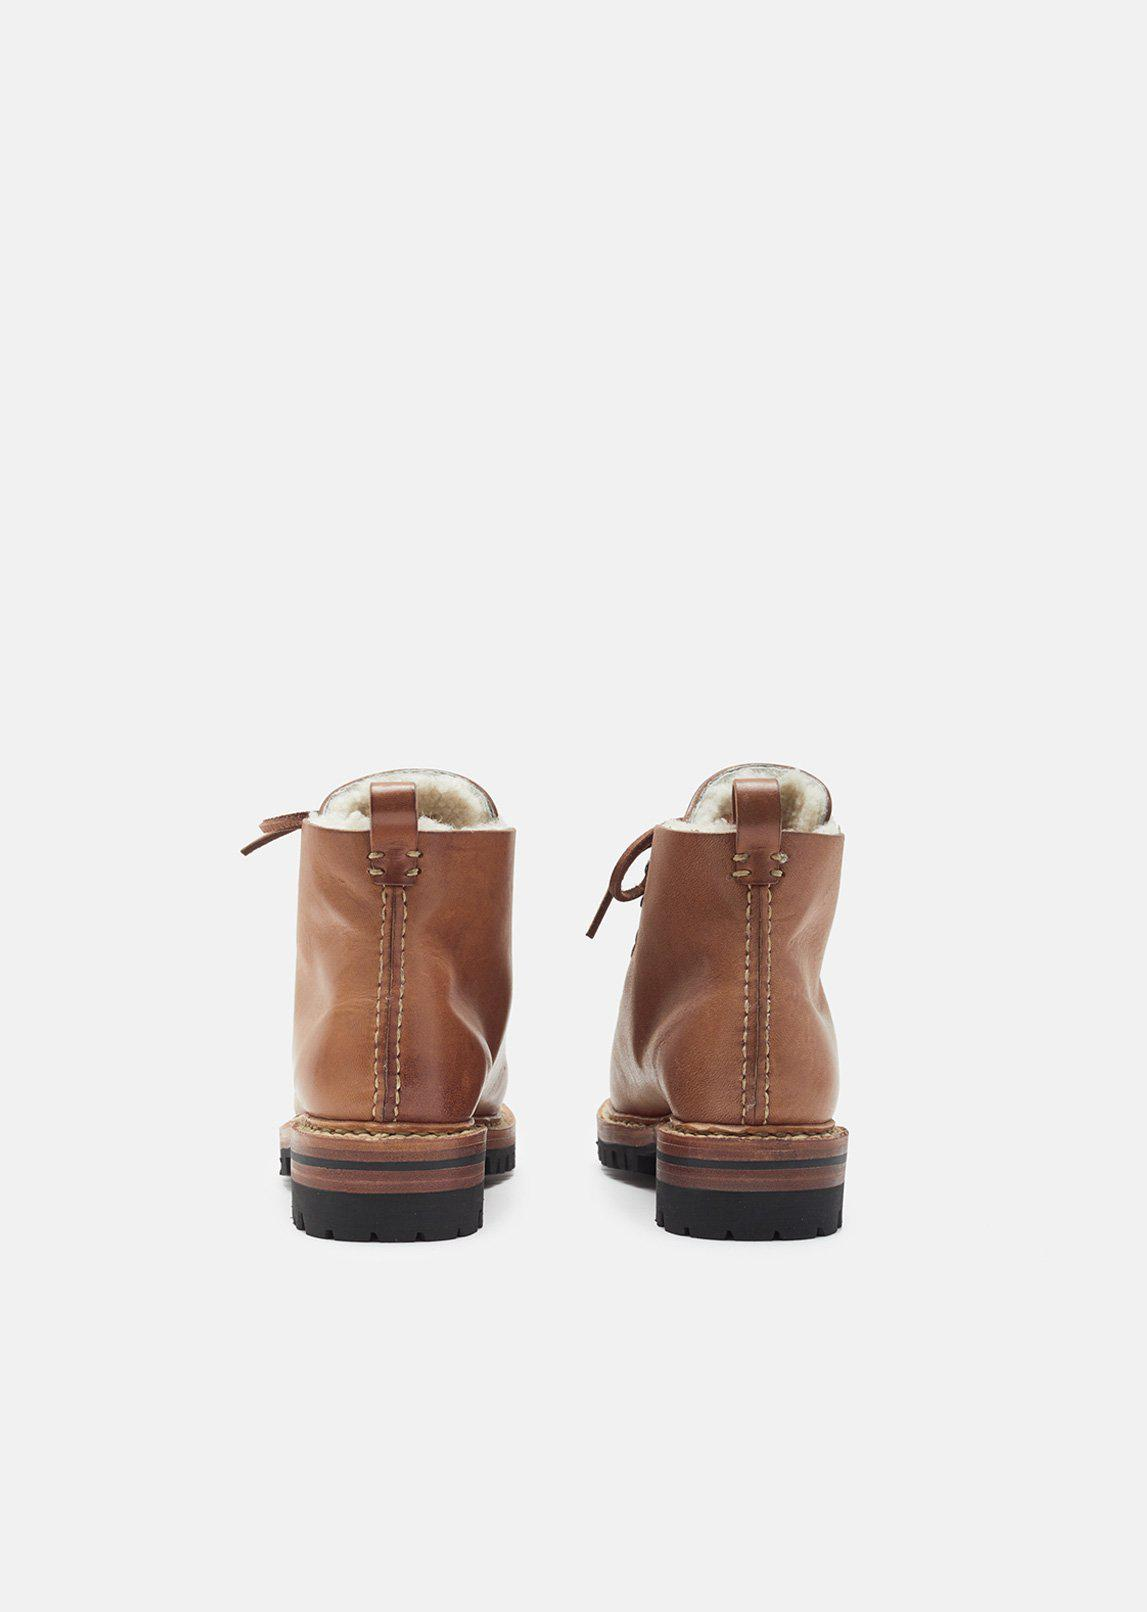 a3ca6719ced Feit Brown Whipstitch Hiker Boots